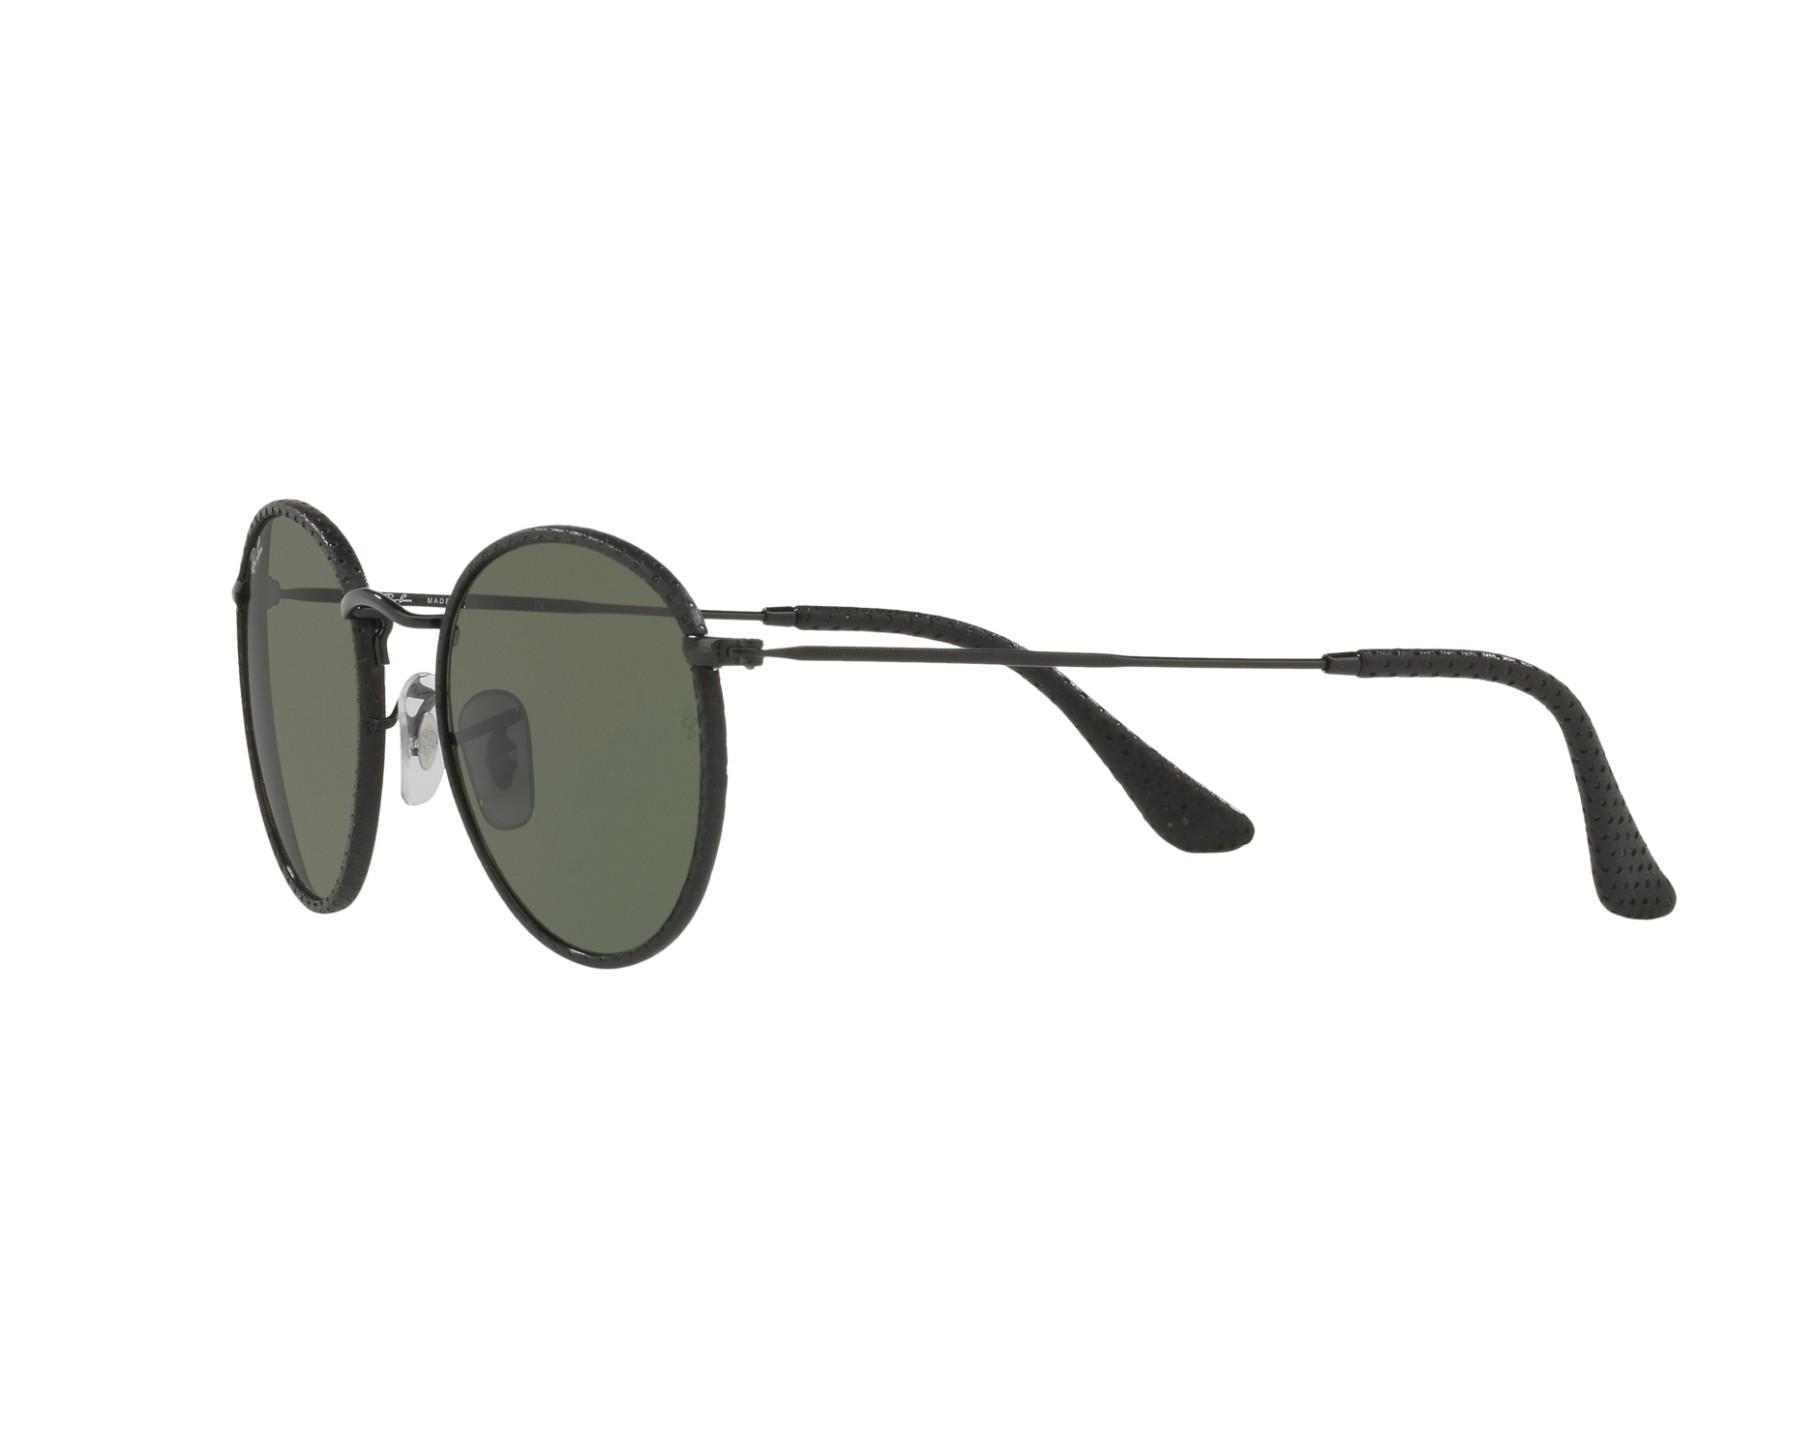 Ray Ban RB 3422-Q 9040 Sonnenbrille verglast LB3r5I